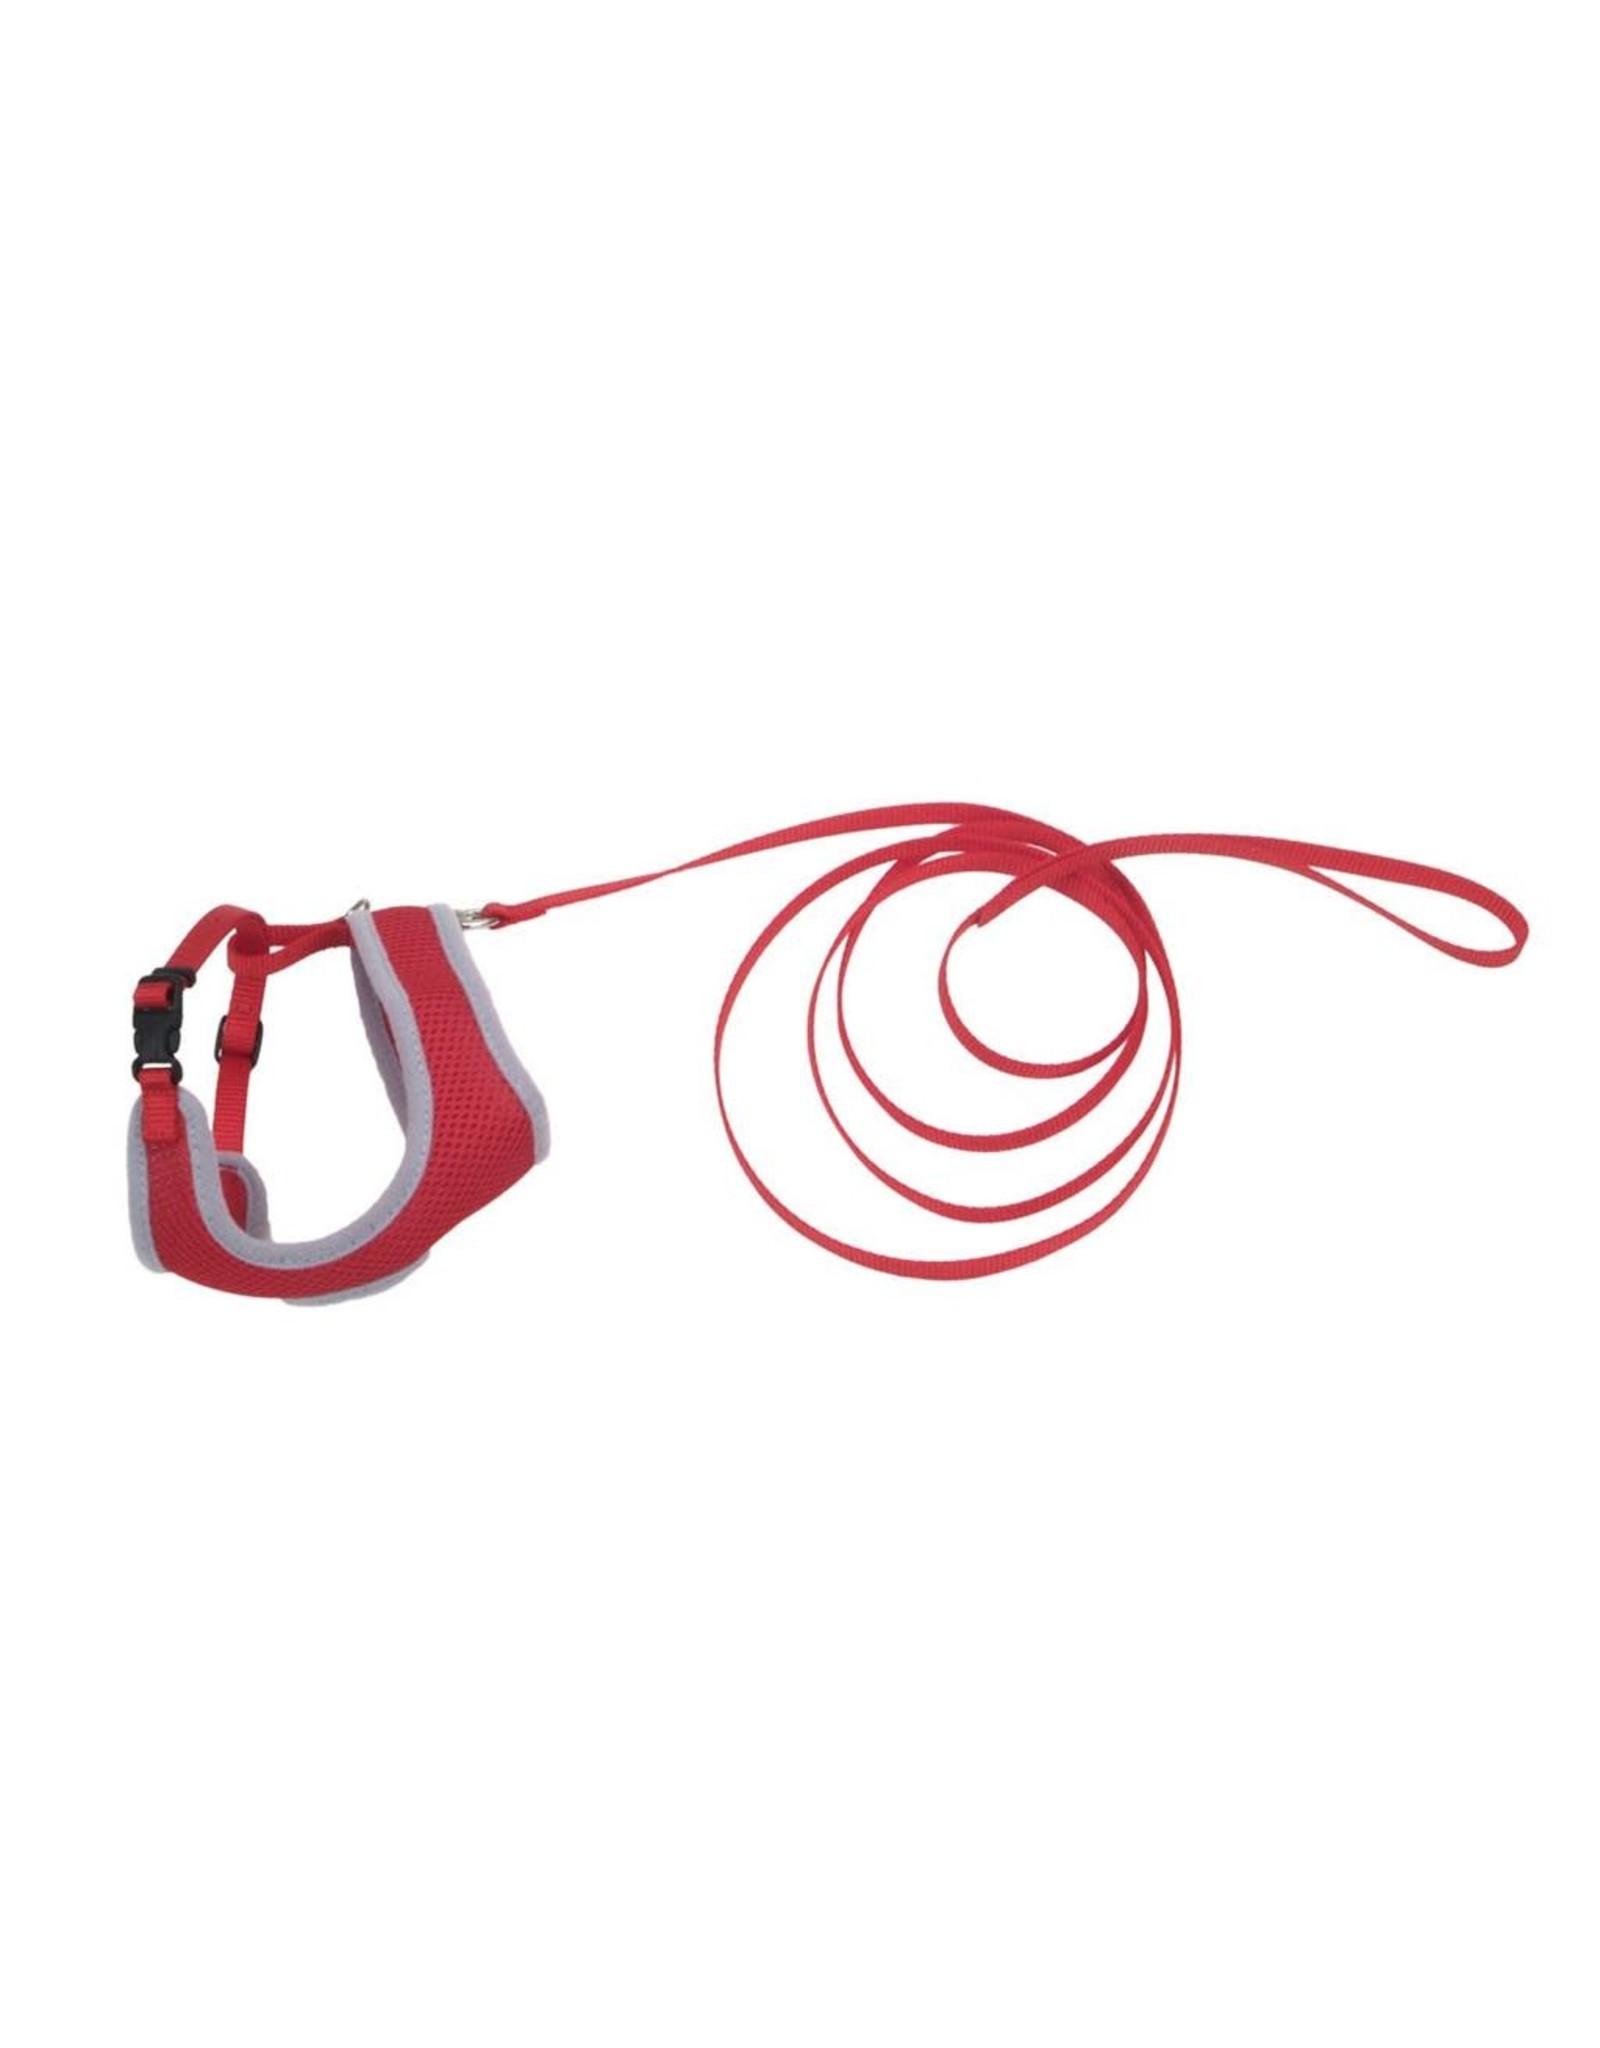 Coastal Pet Products Comfort Soft Harness & Lead 6'